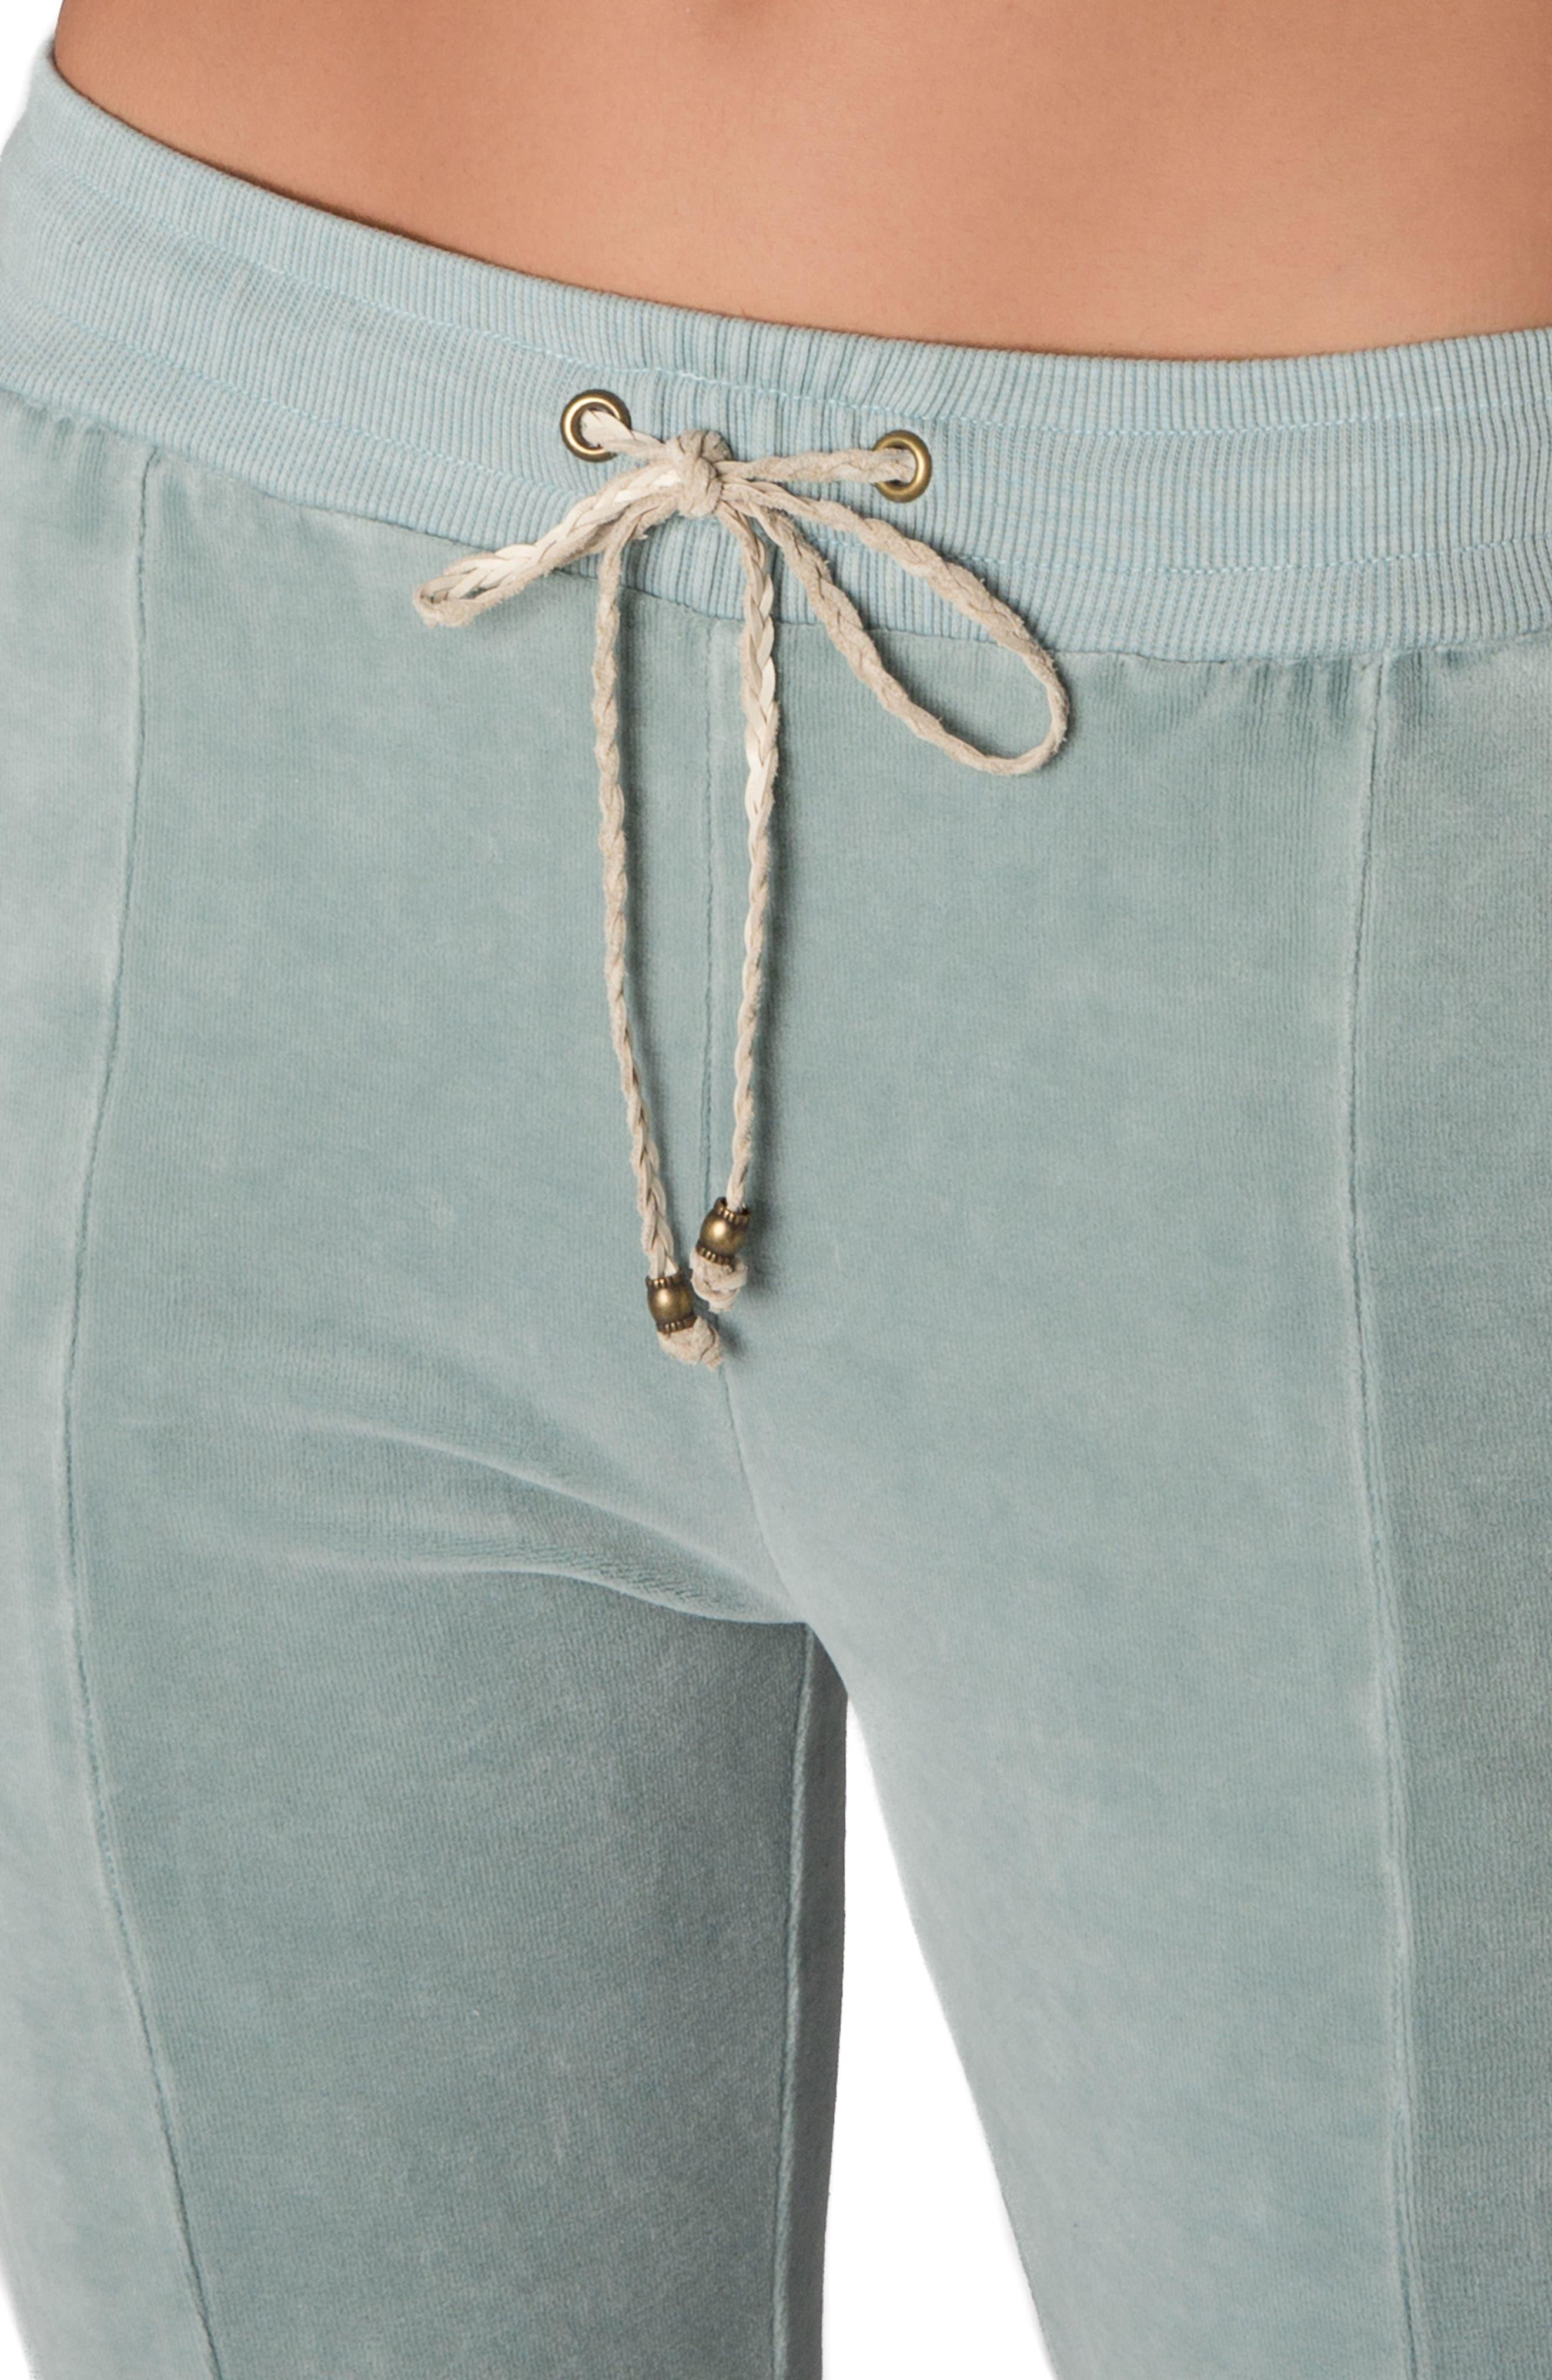 High Waist Velour Track Pants,                             Alternate thumbnail 4, color,                             400